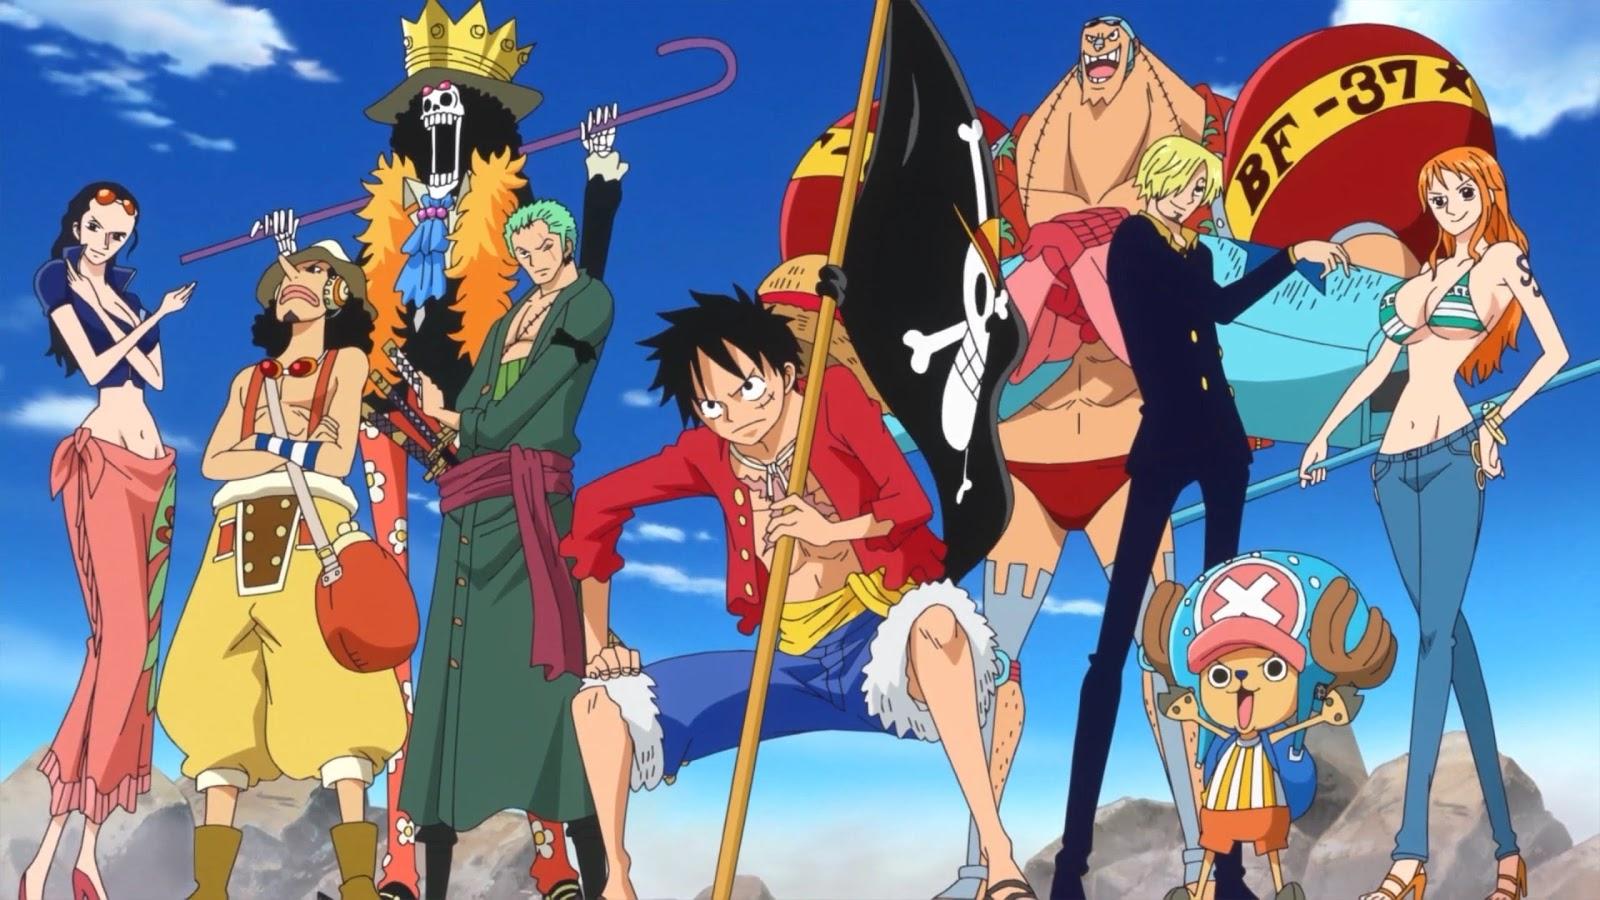 Movie One Piece